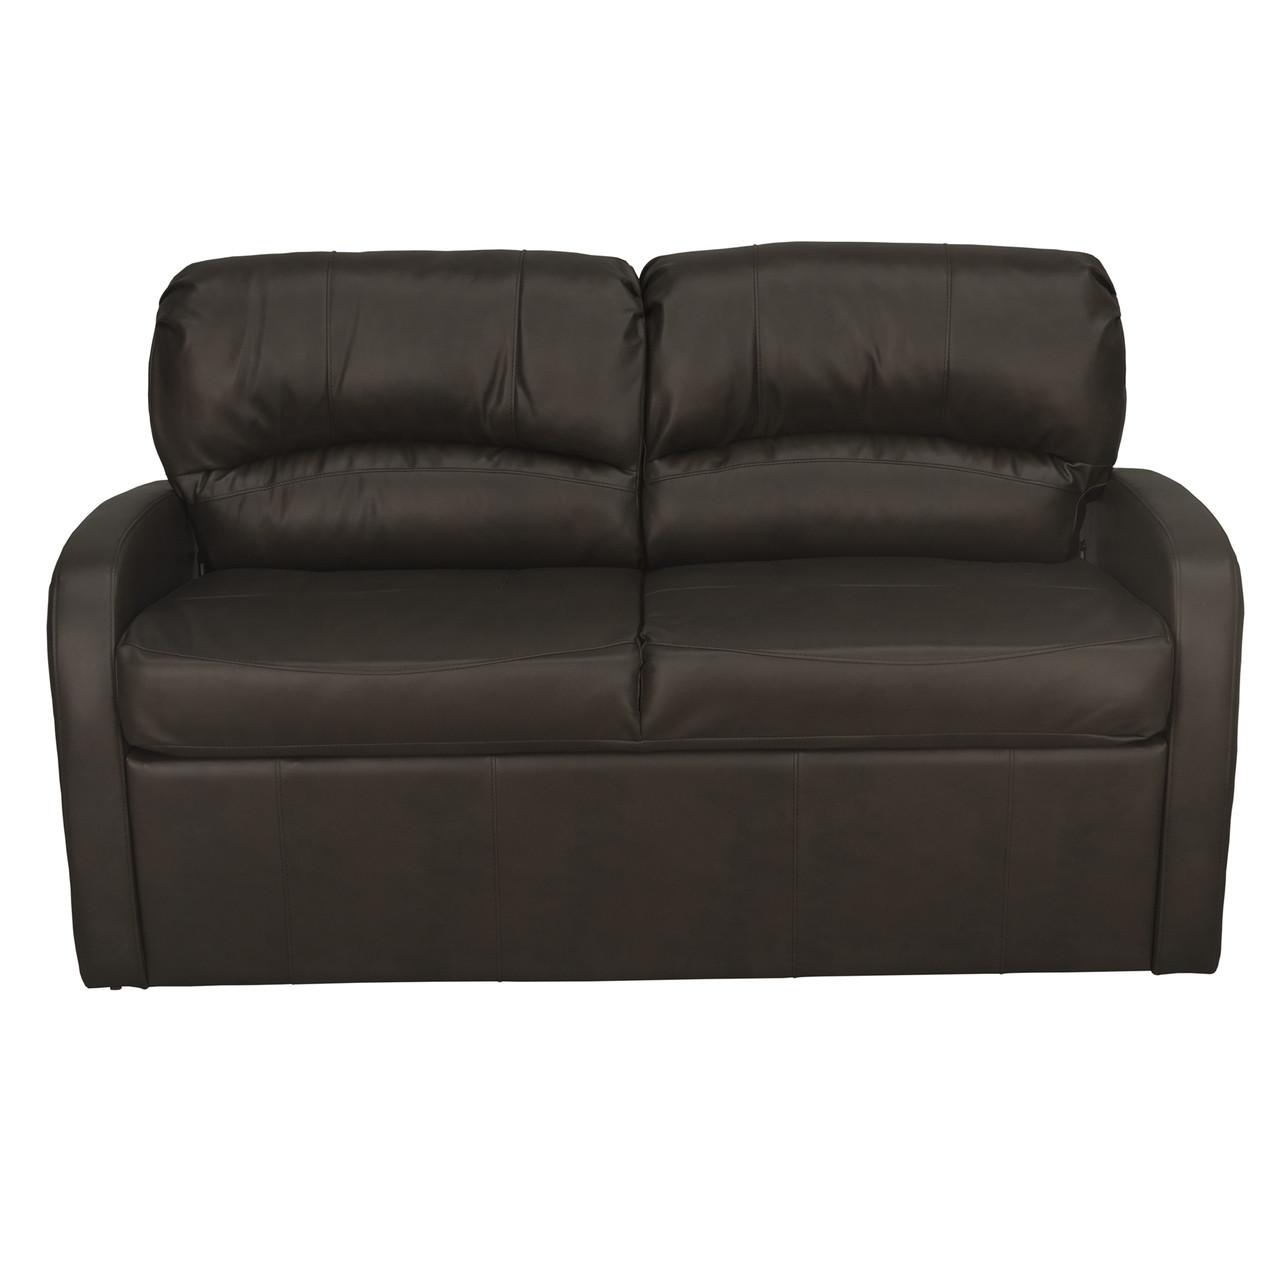 Phenomenal Recpro Charles 70 Jack Knife Rv Sleeper Sofa Furniture Pdpeps Interior Chair Design Pdpepsorg